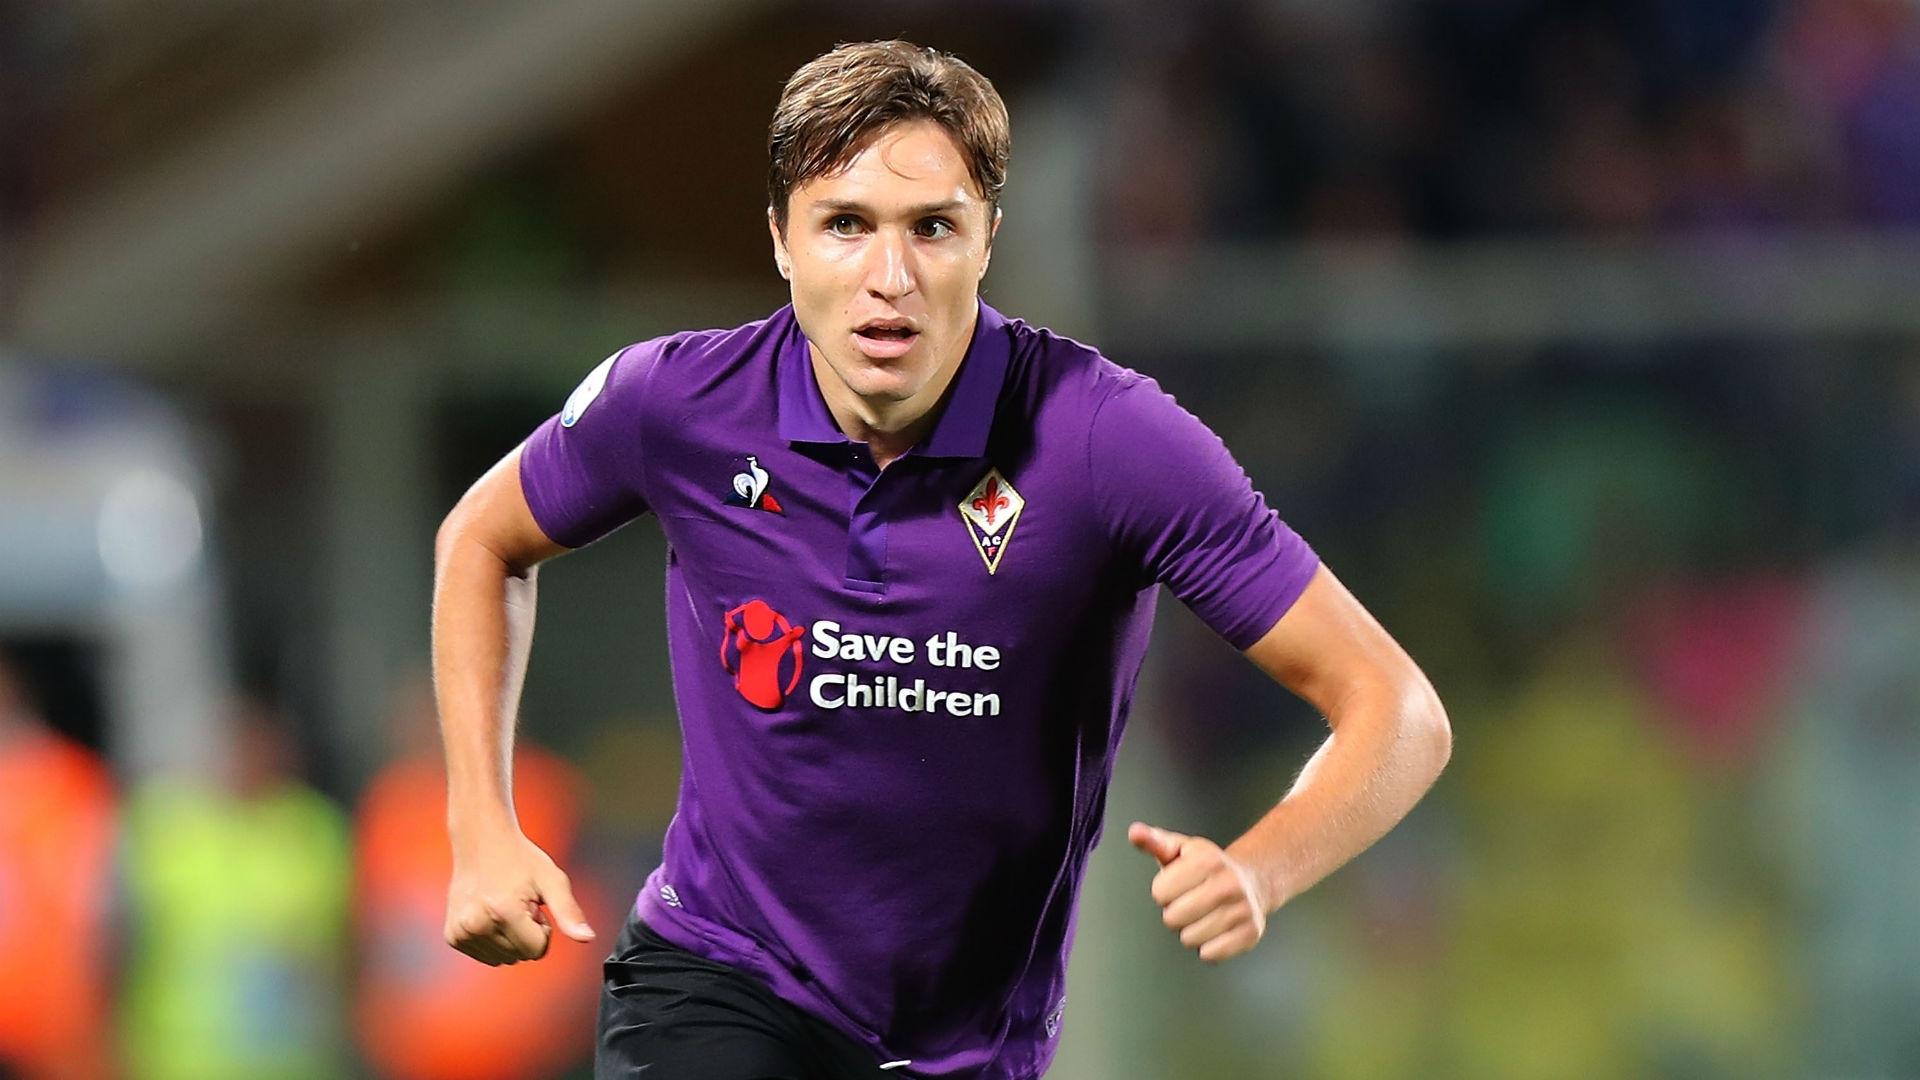 Cầu thủ tài năng Federico Chiesa